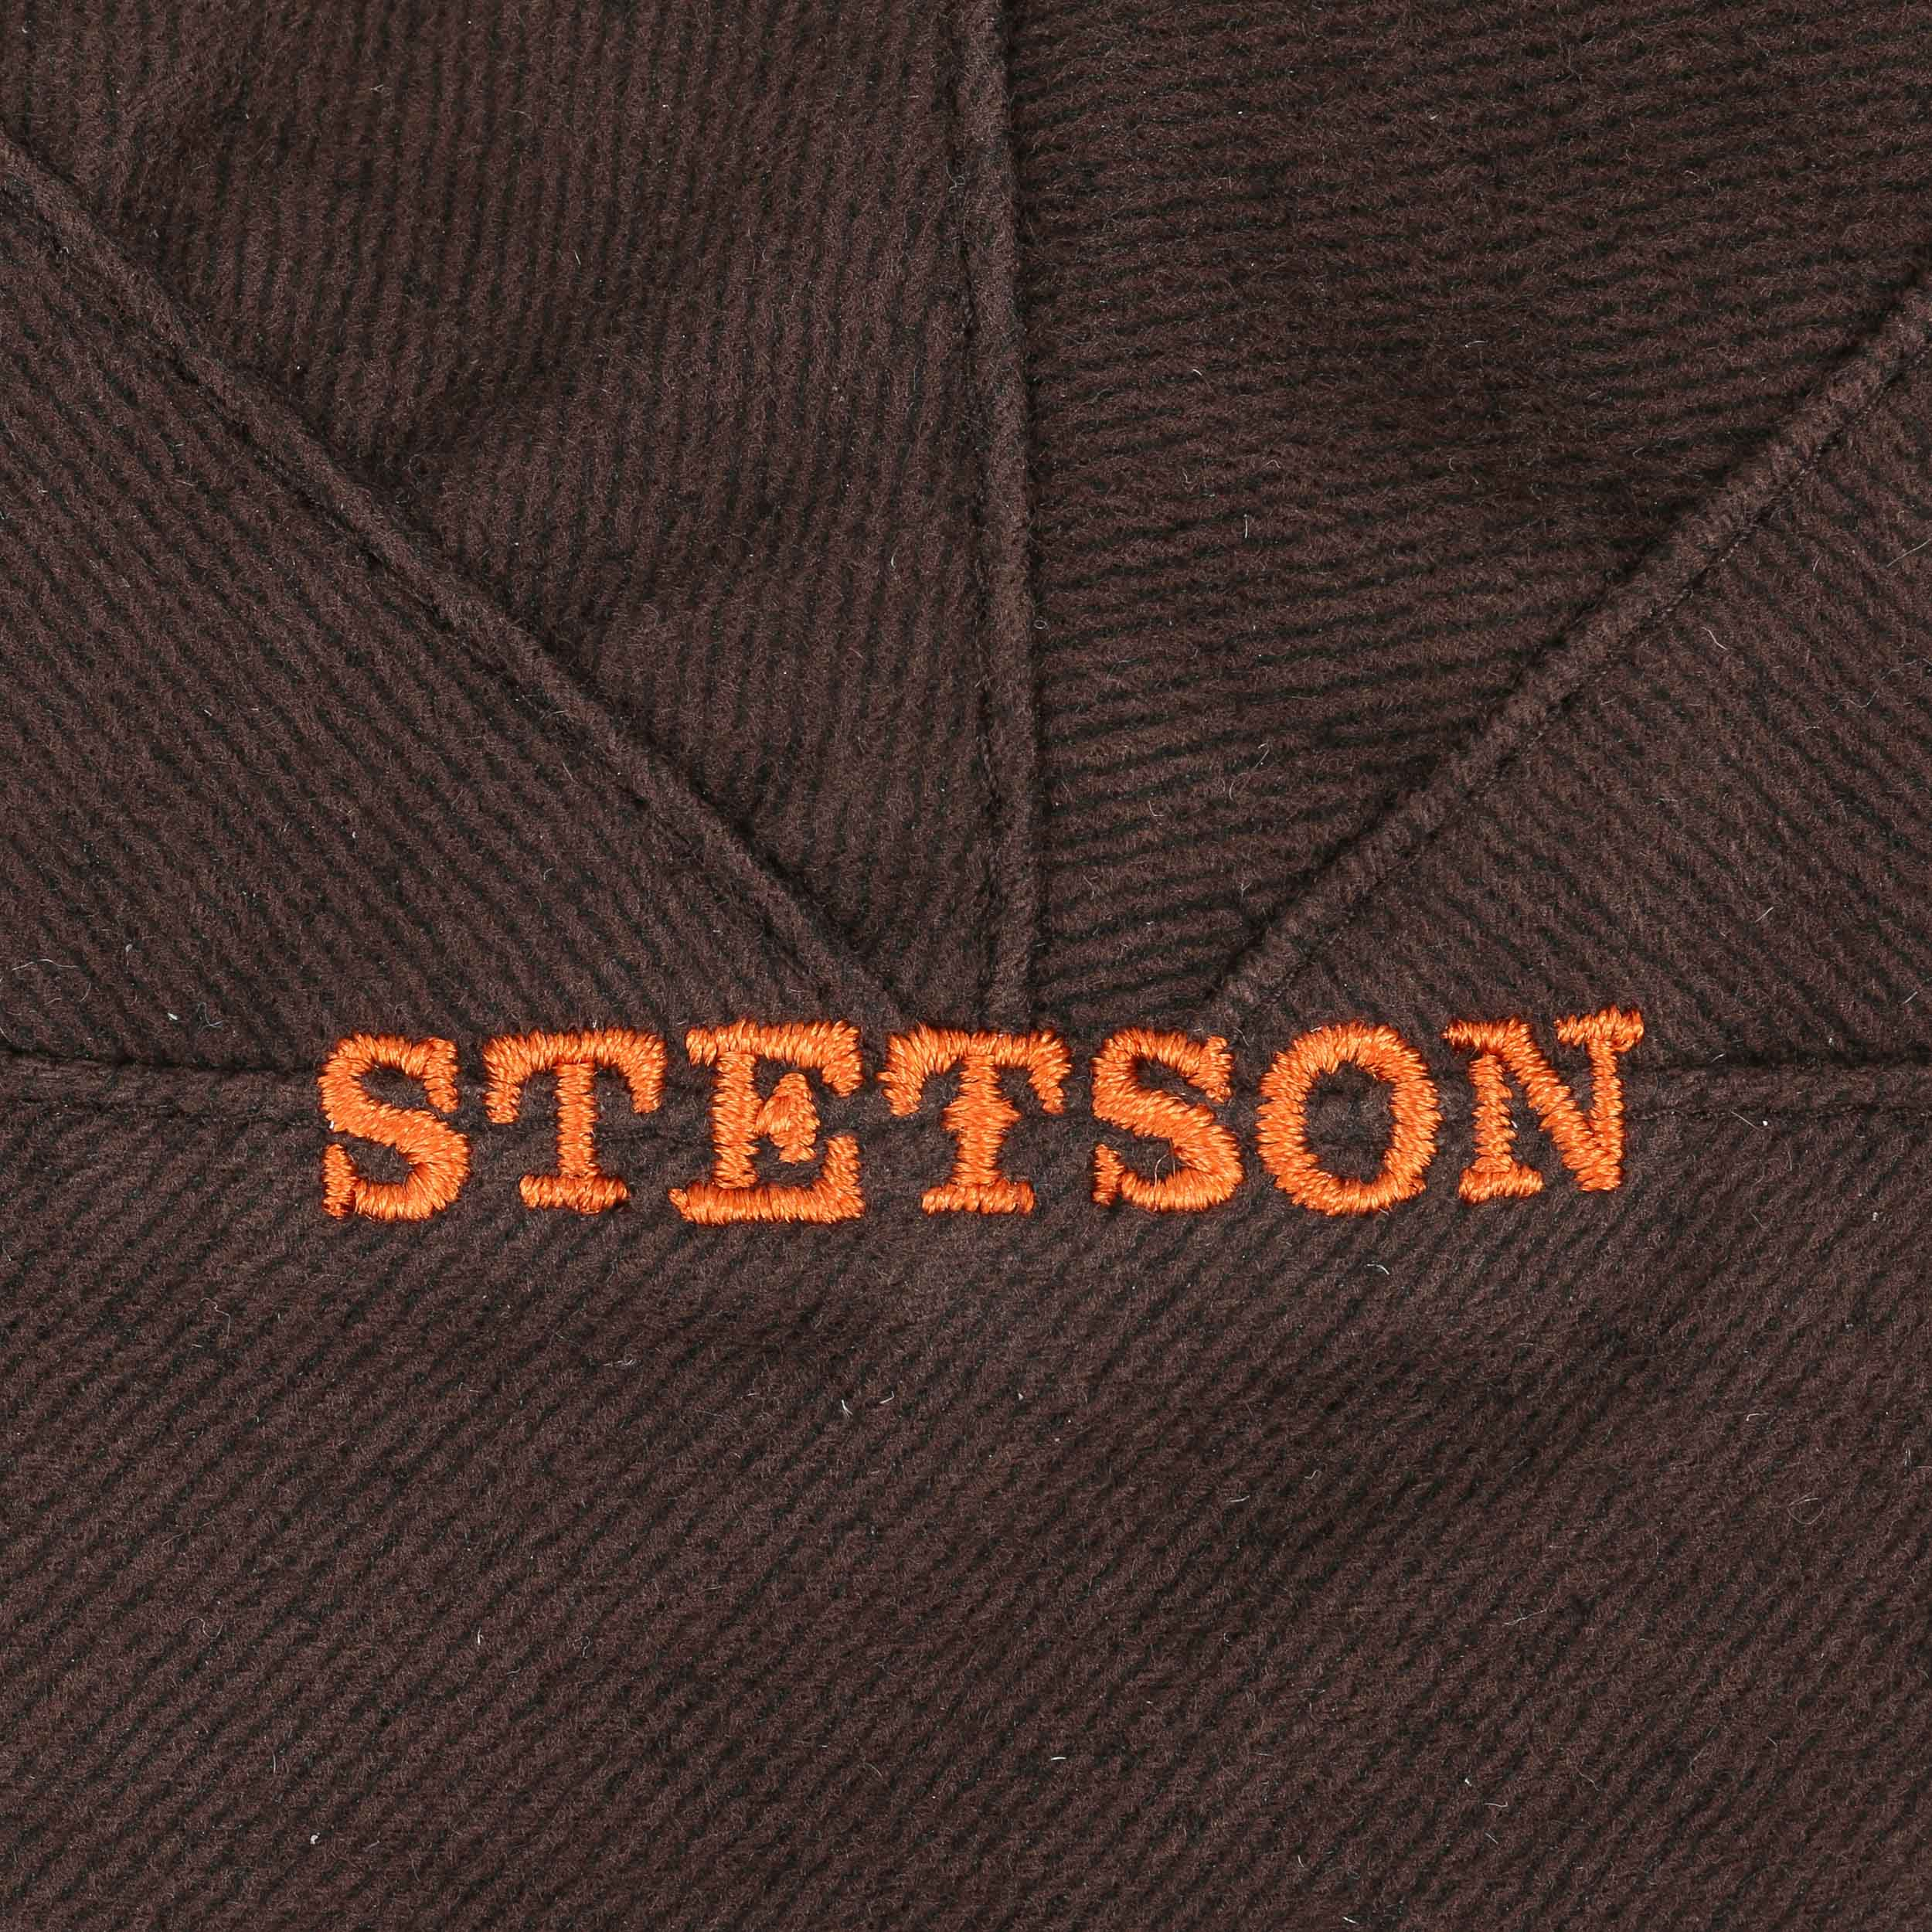 ... Paradise Wool Flat Cap by Stetson - blue 5 ... ca4107ceb27c